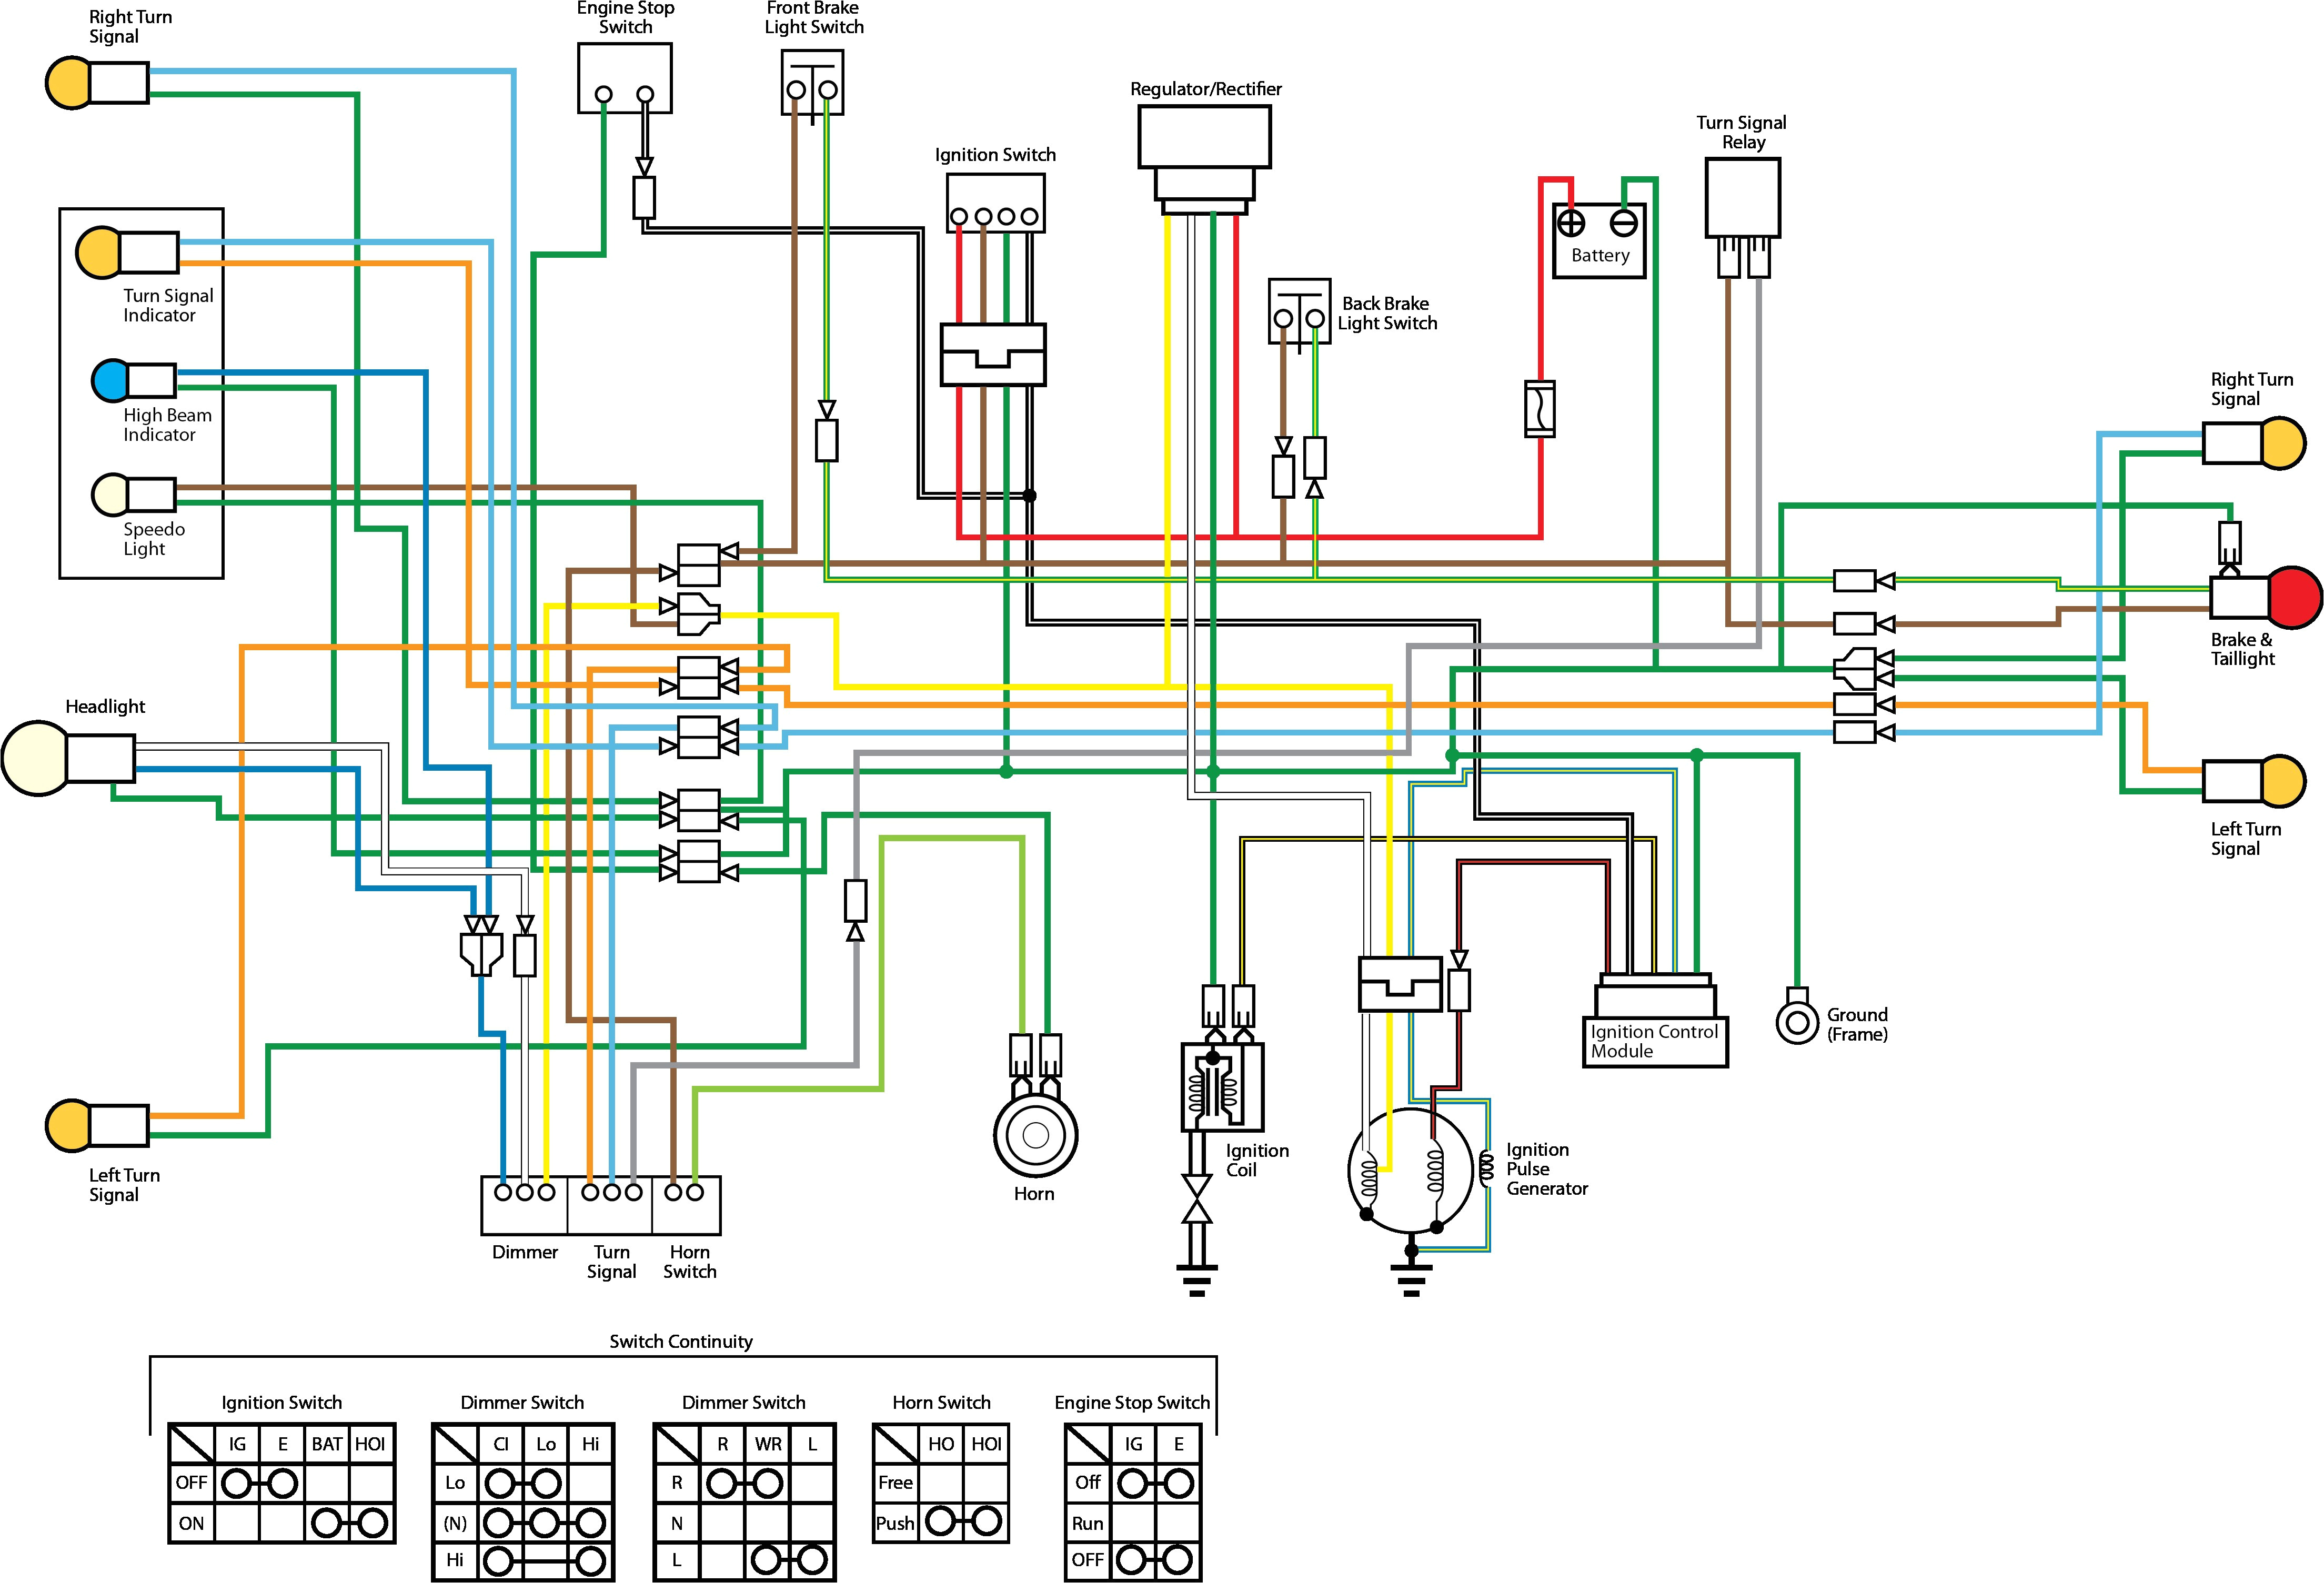 Electric Rc Plane Wiring Diagram Global Electric Motorcars Wiring Diagrams Wiring Diagram Perfomance